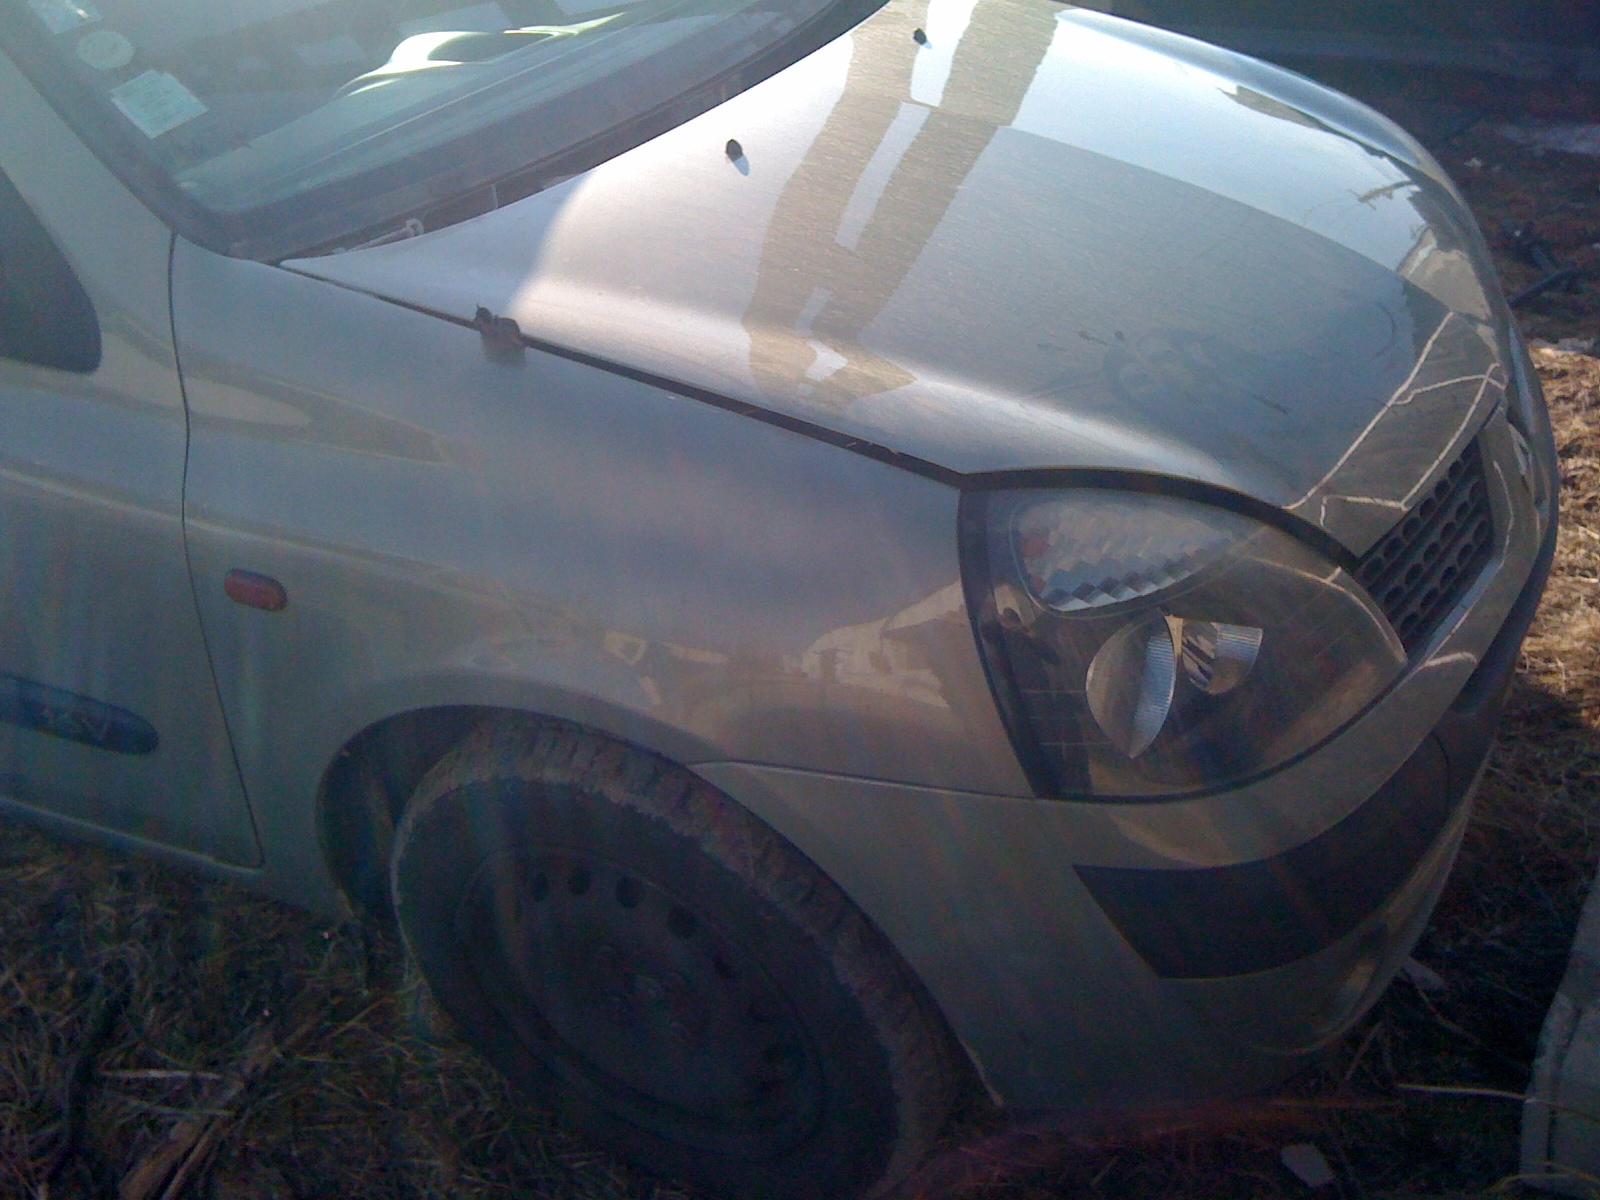 Renault Clio-II avariat 2003 Benzina Hatchback - 16 Februarie 2011 - Poza 2